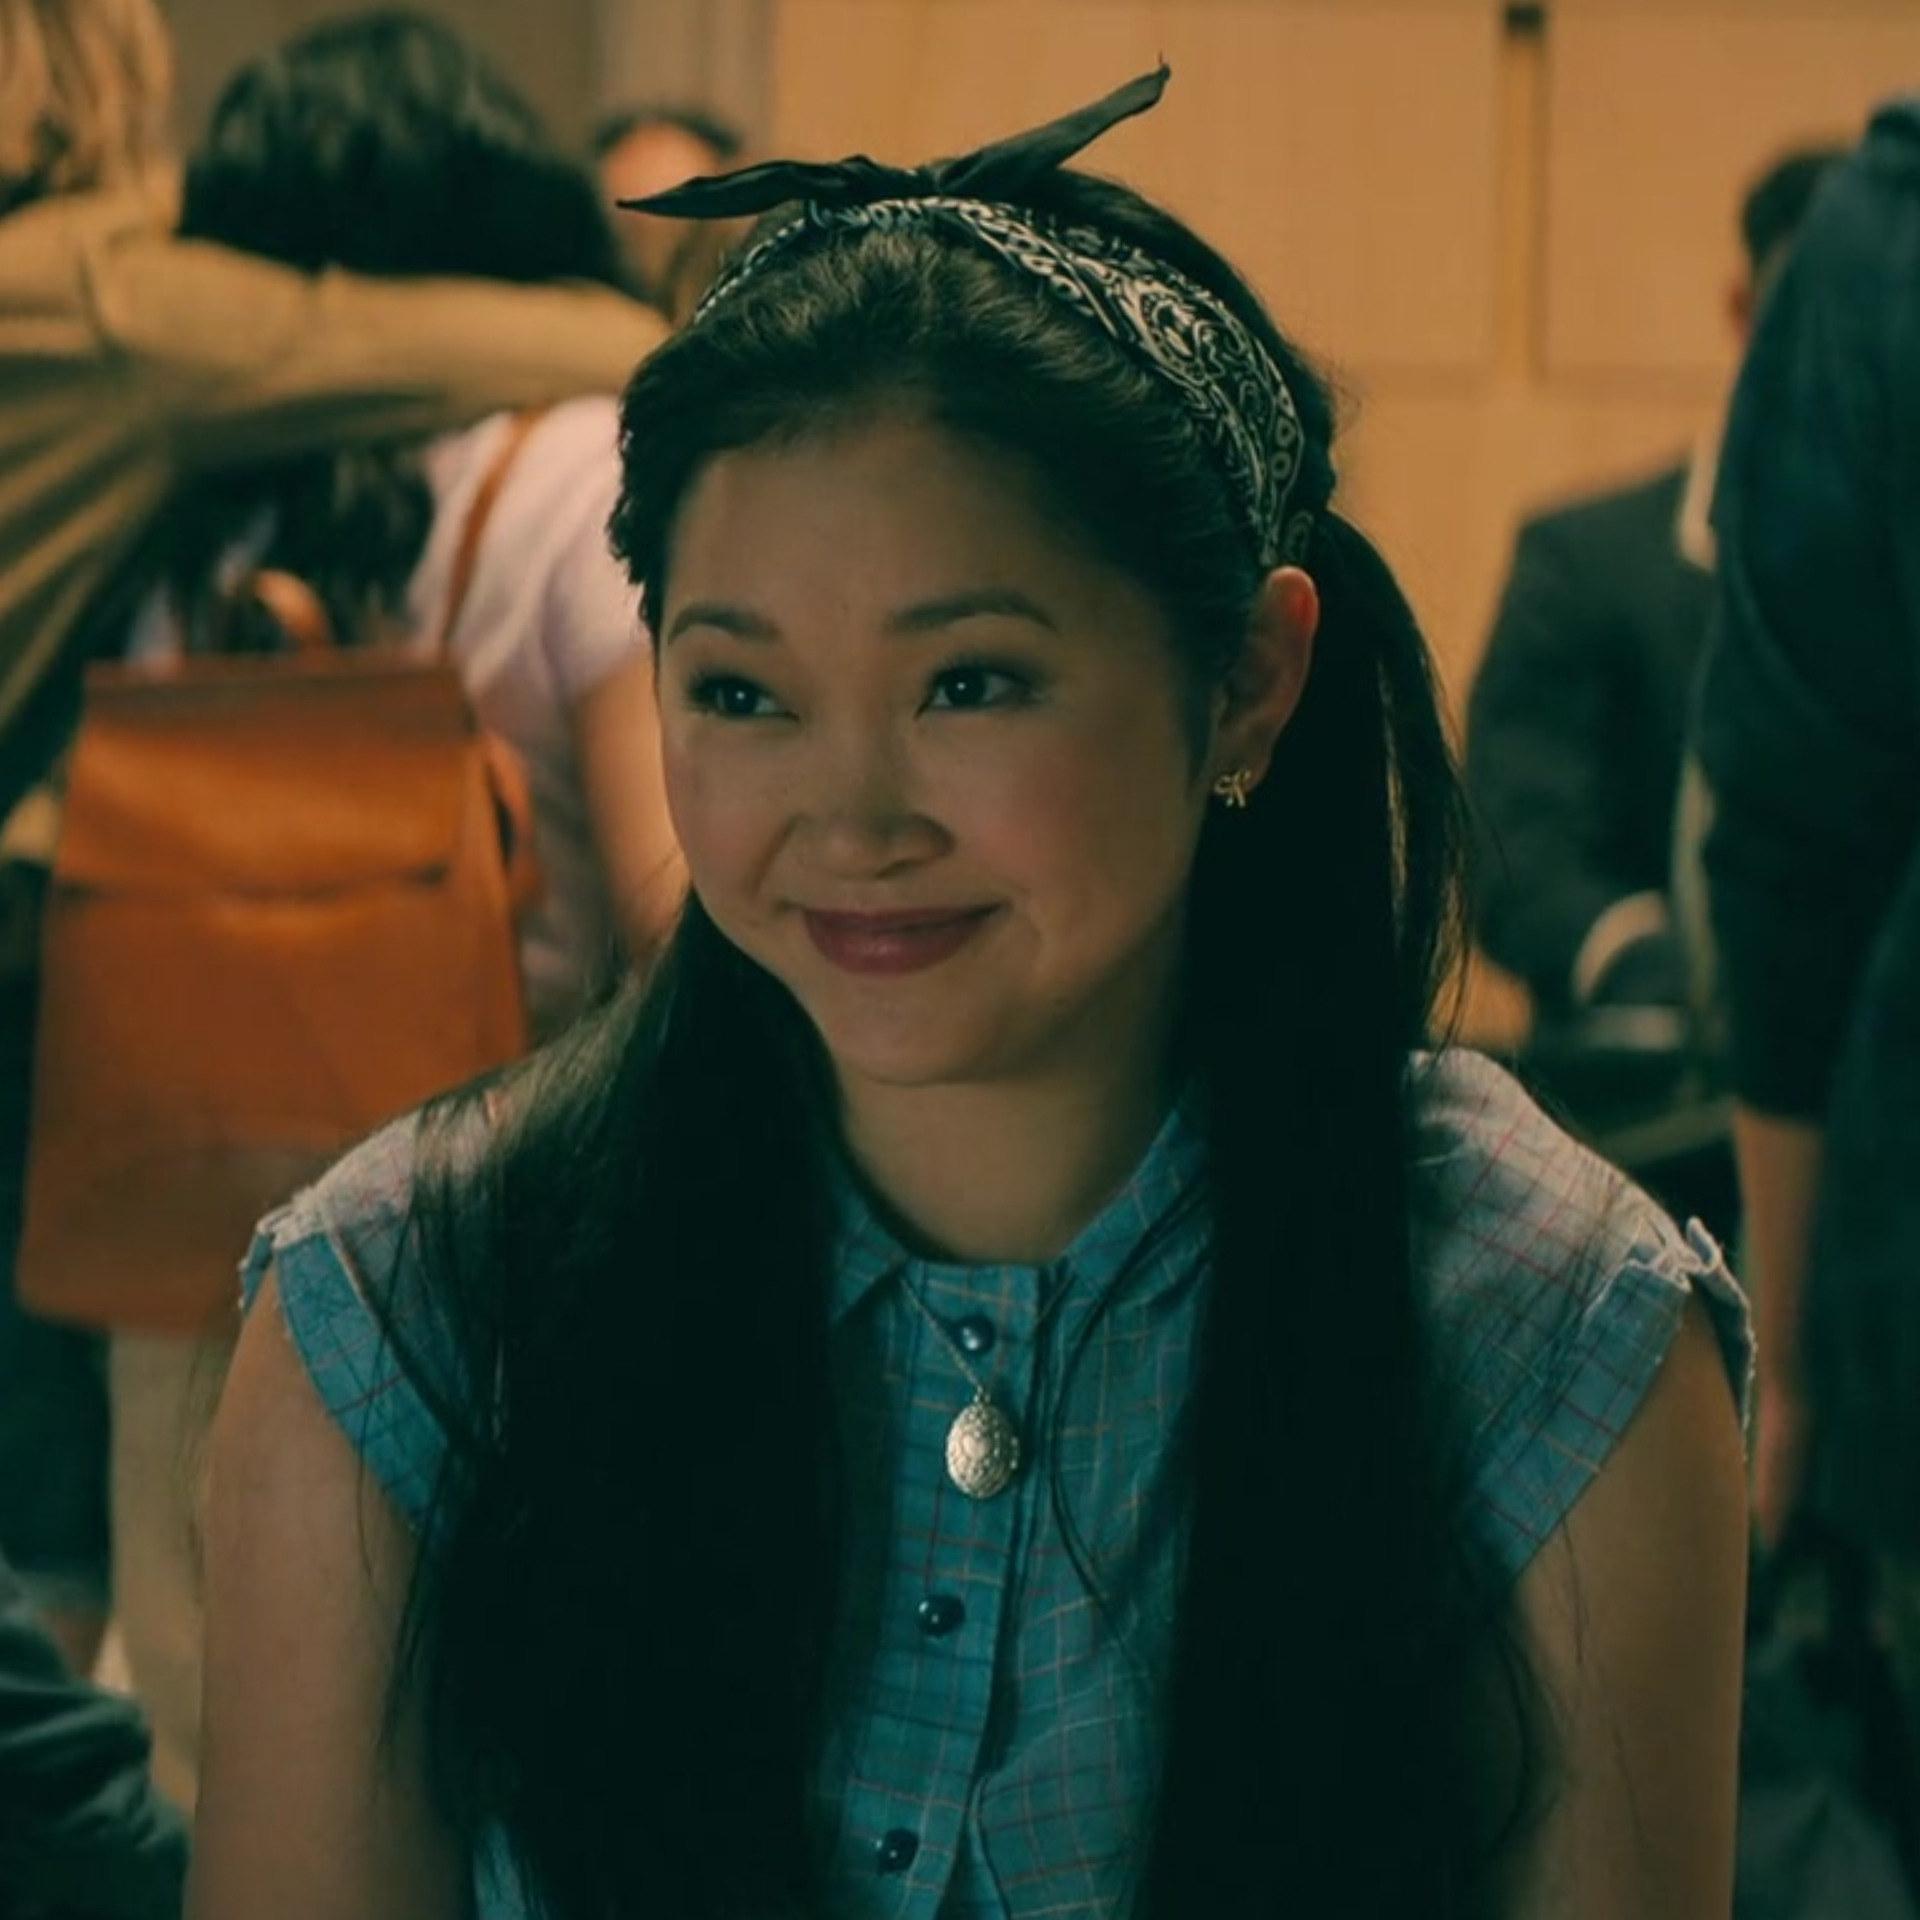 Lara Jean in denim top and bandana headband